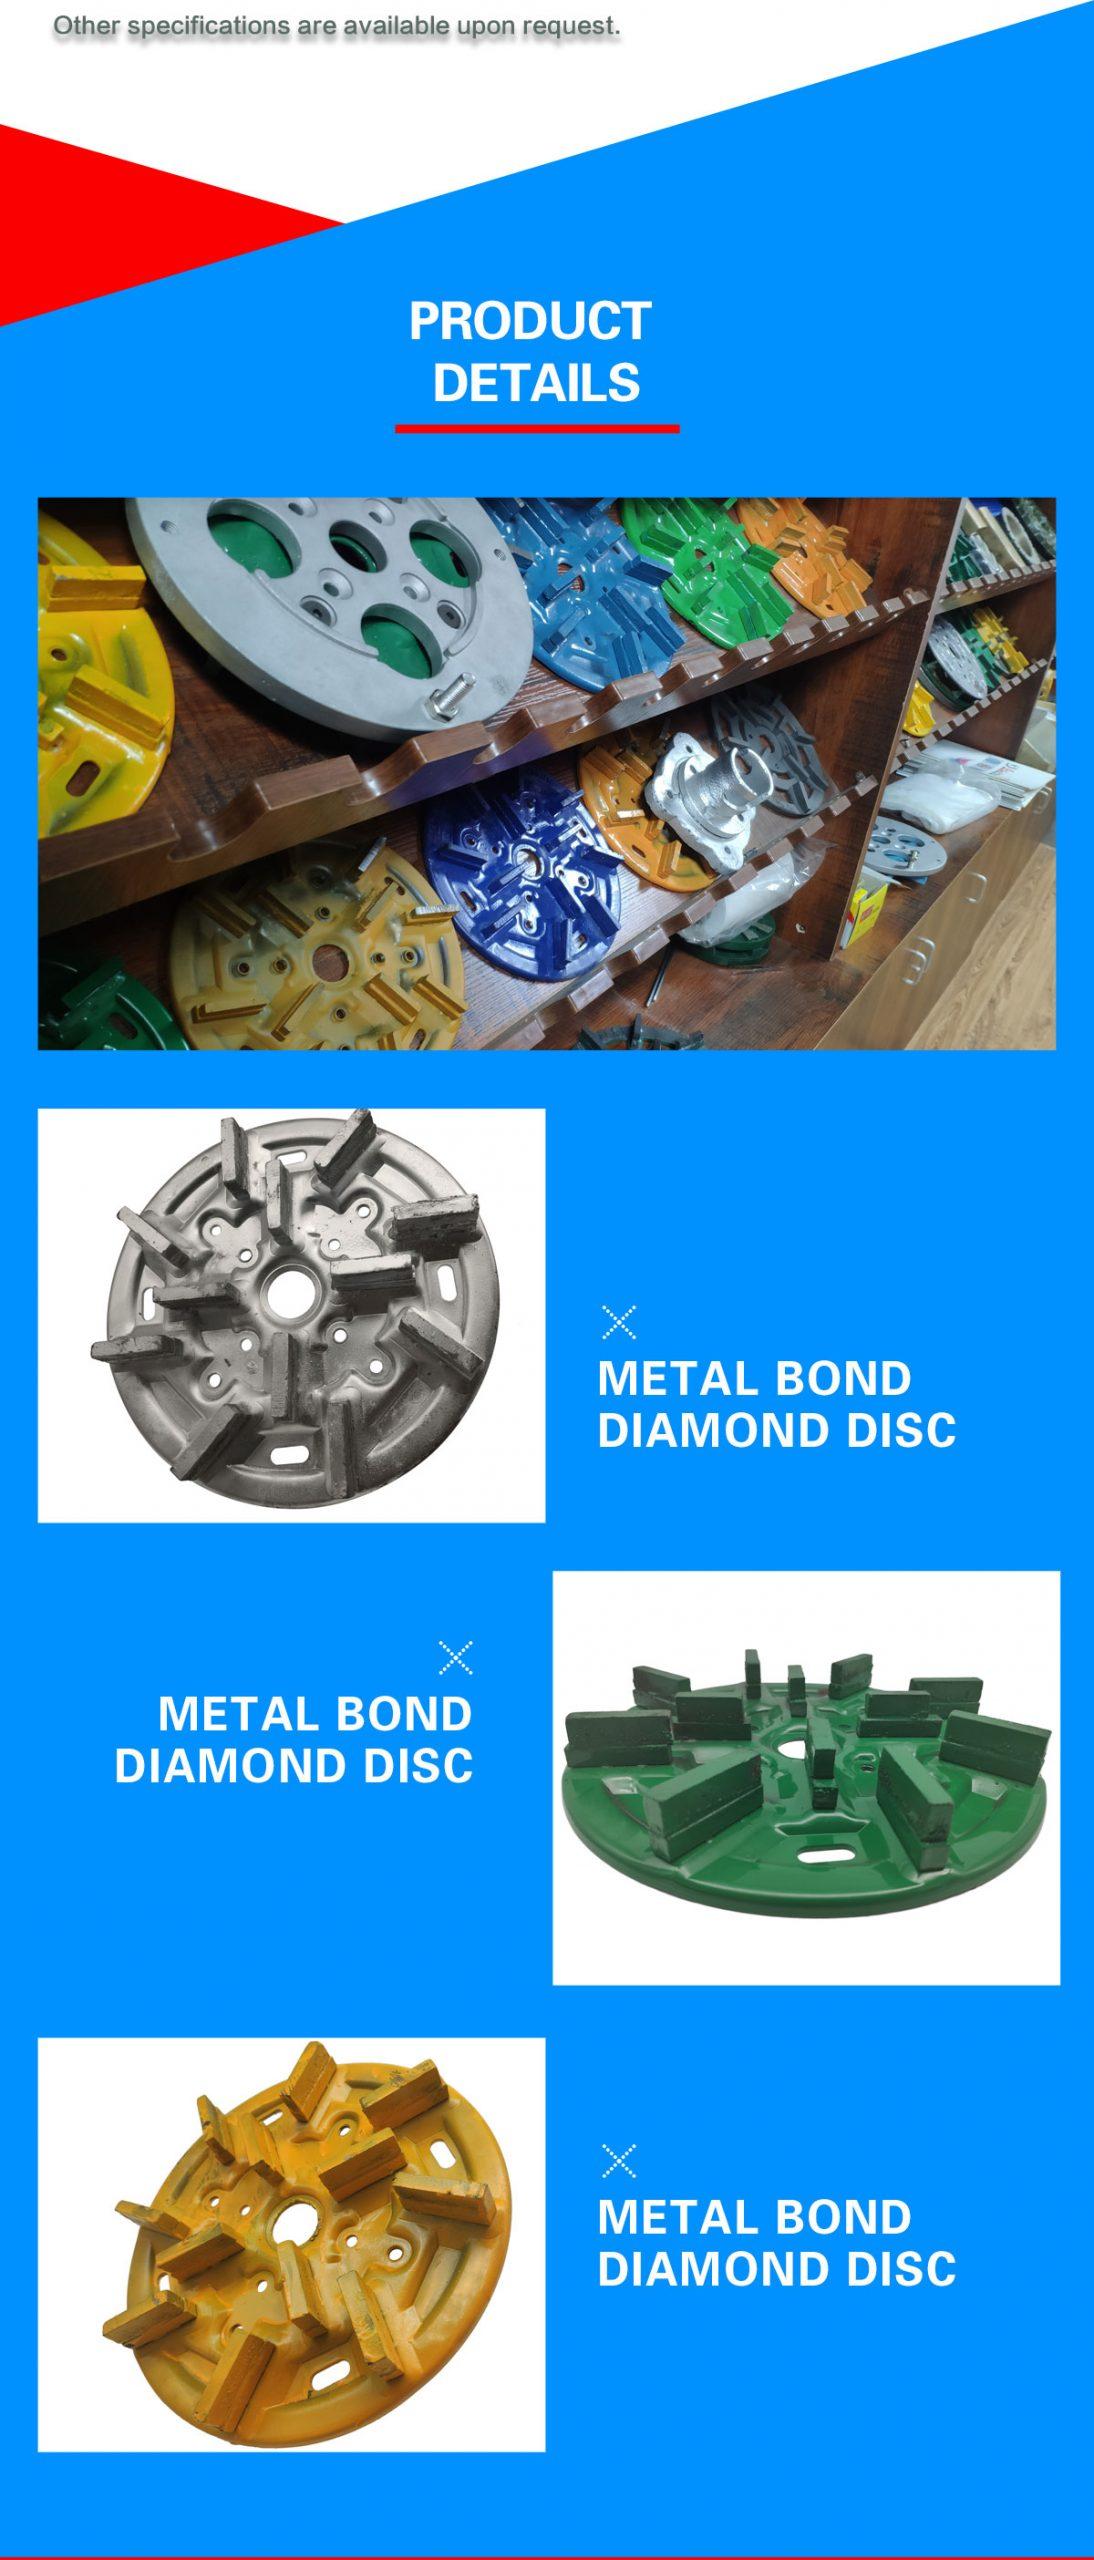 granite grinding and polishing tools